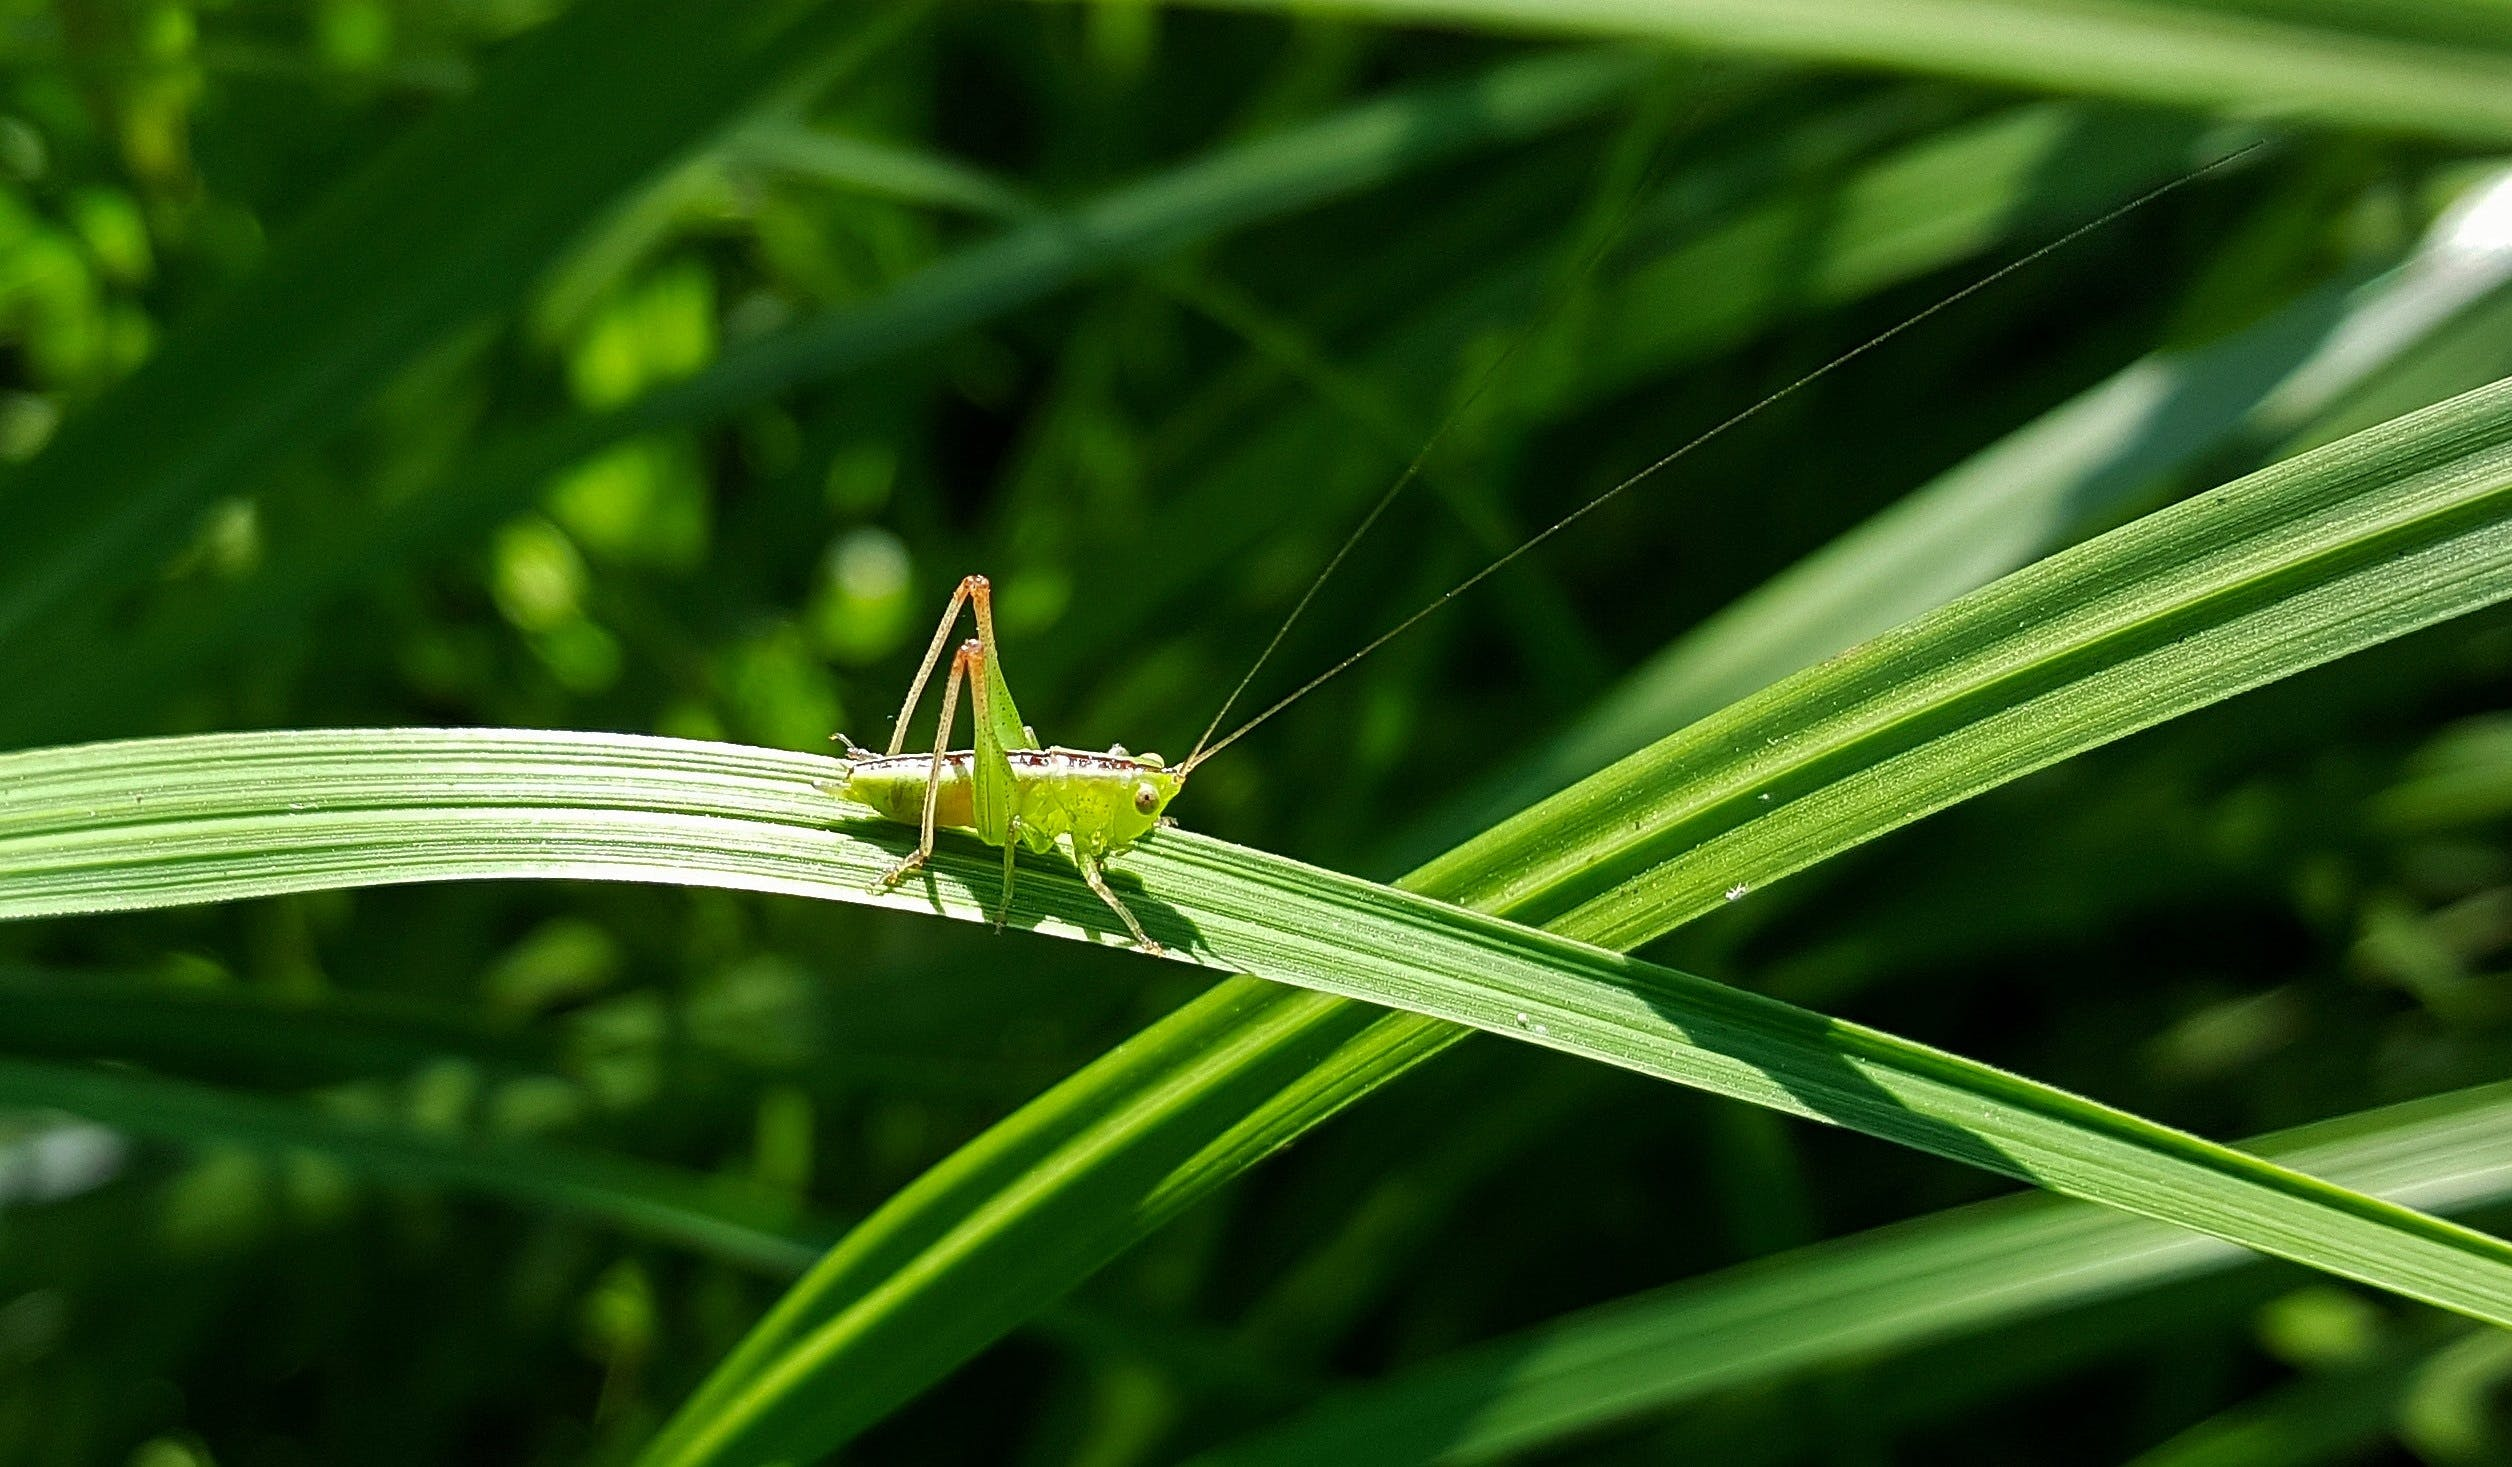 Green Grasshopper Perching on the Green Leaf Plant